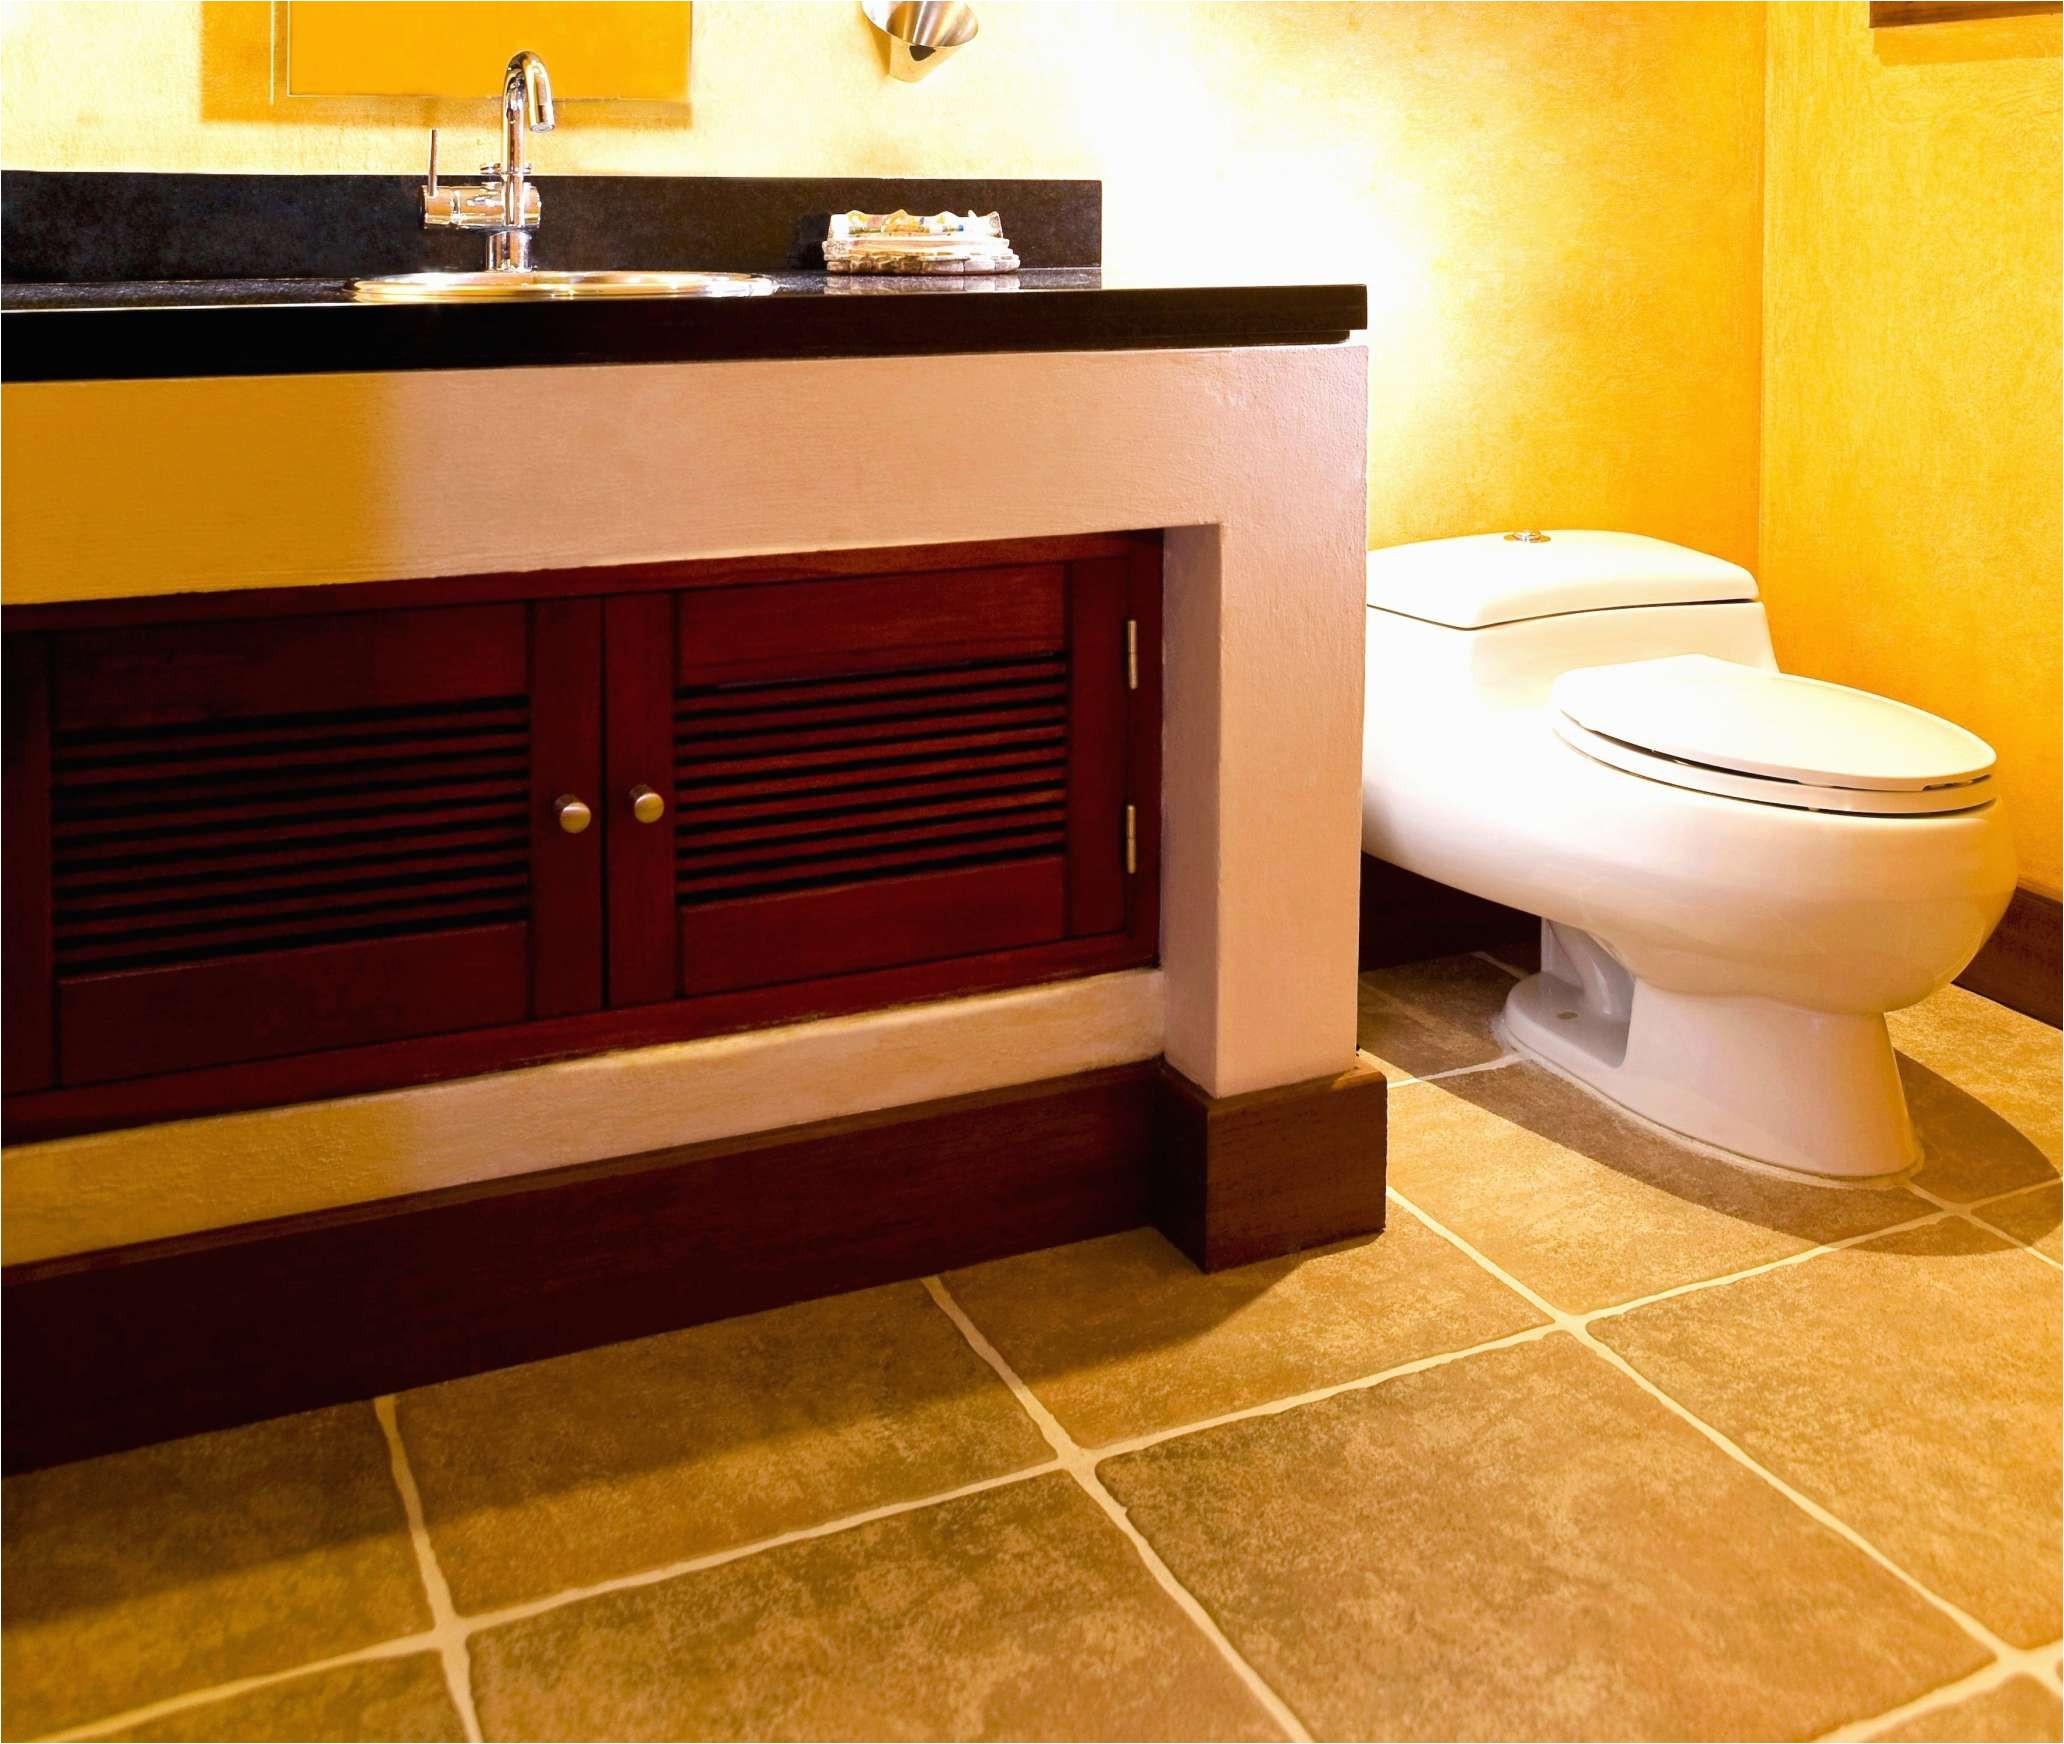 amazing bathroom ideas tile at best flooring for kitchens lovely floor tiles mosaic bathroom 0d new